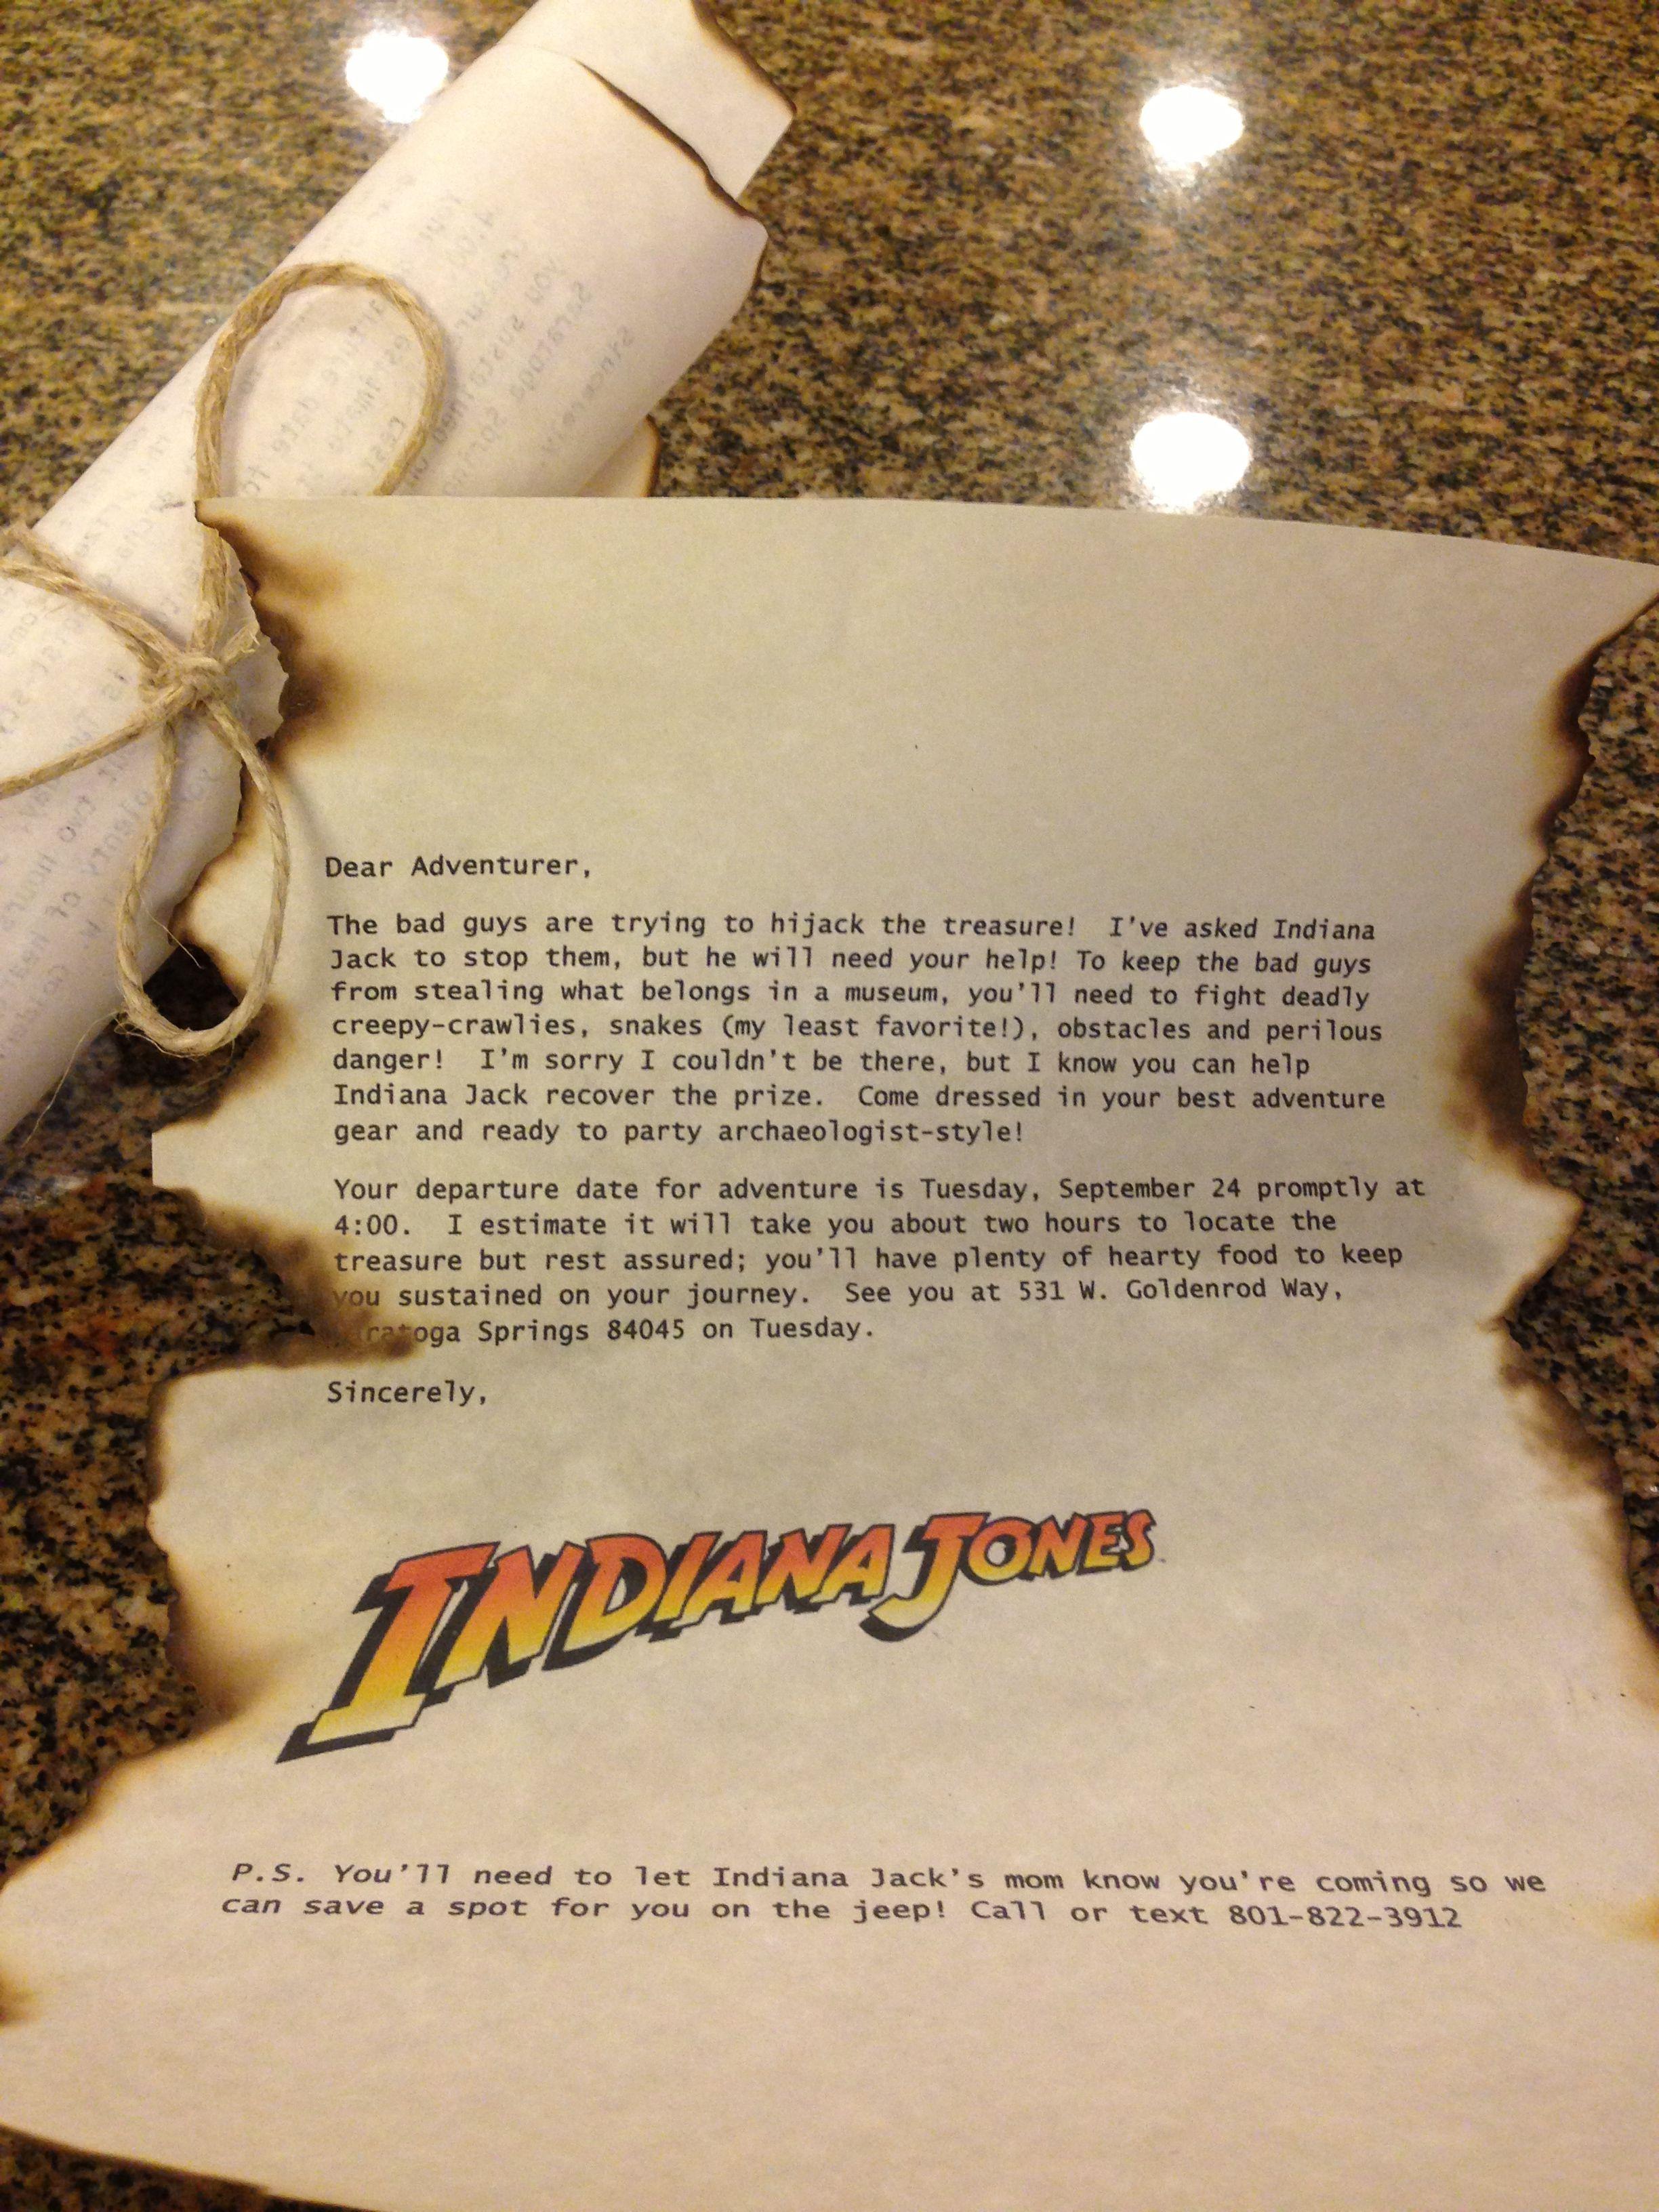 Indiana Jones birthday invitations. Clever!